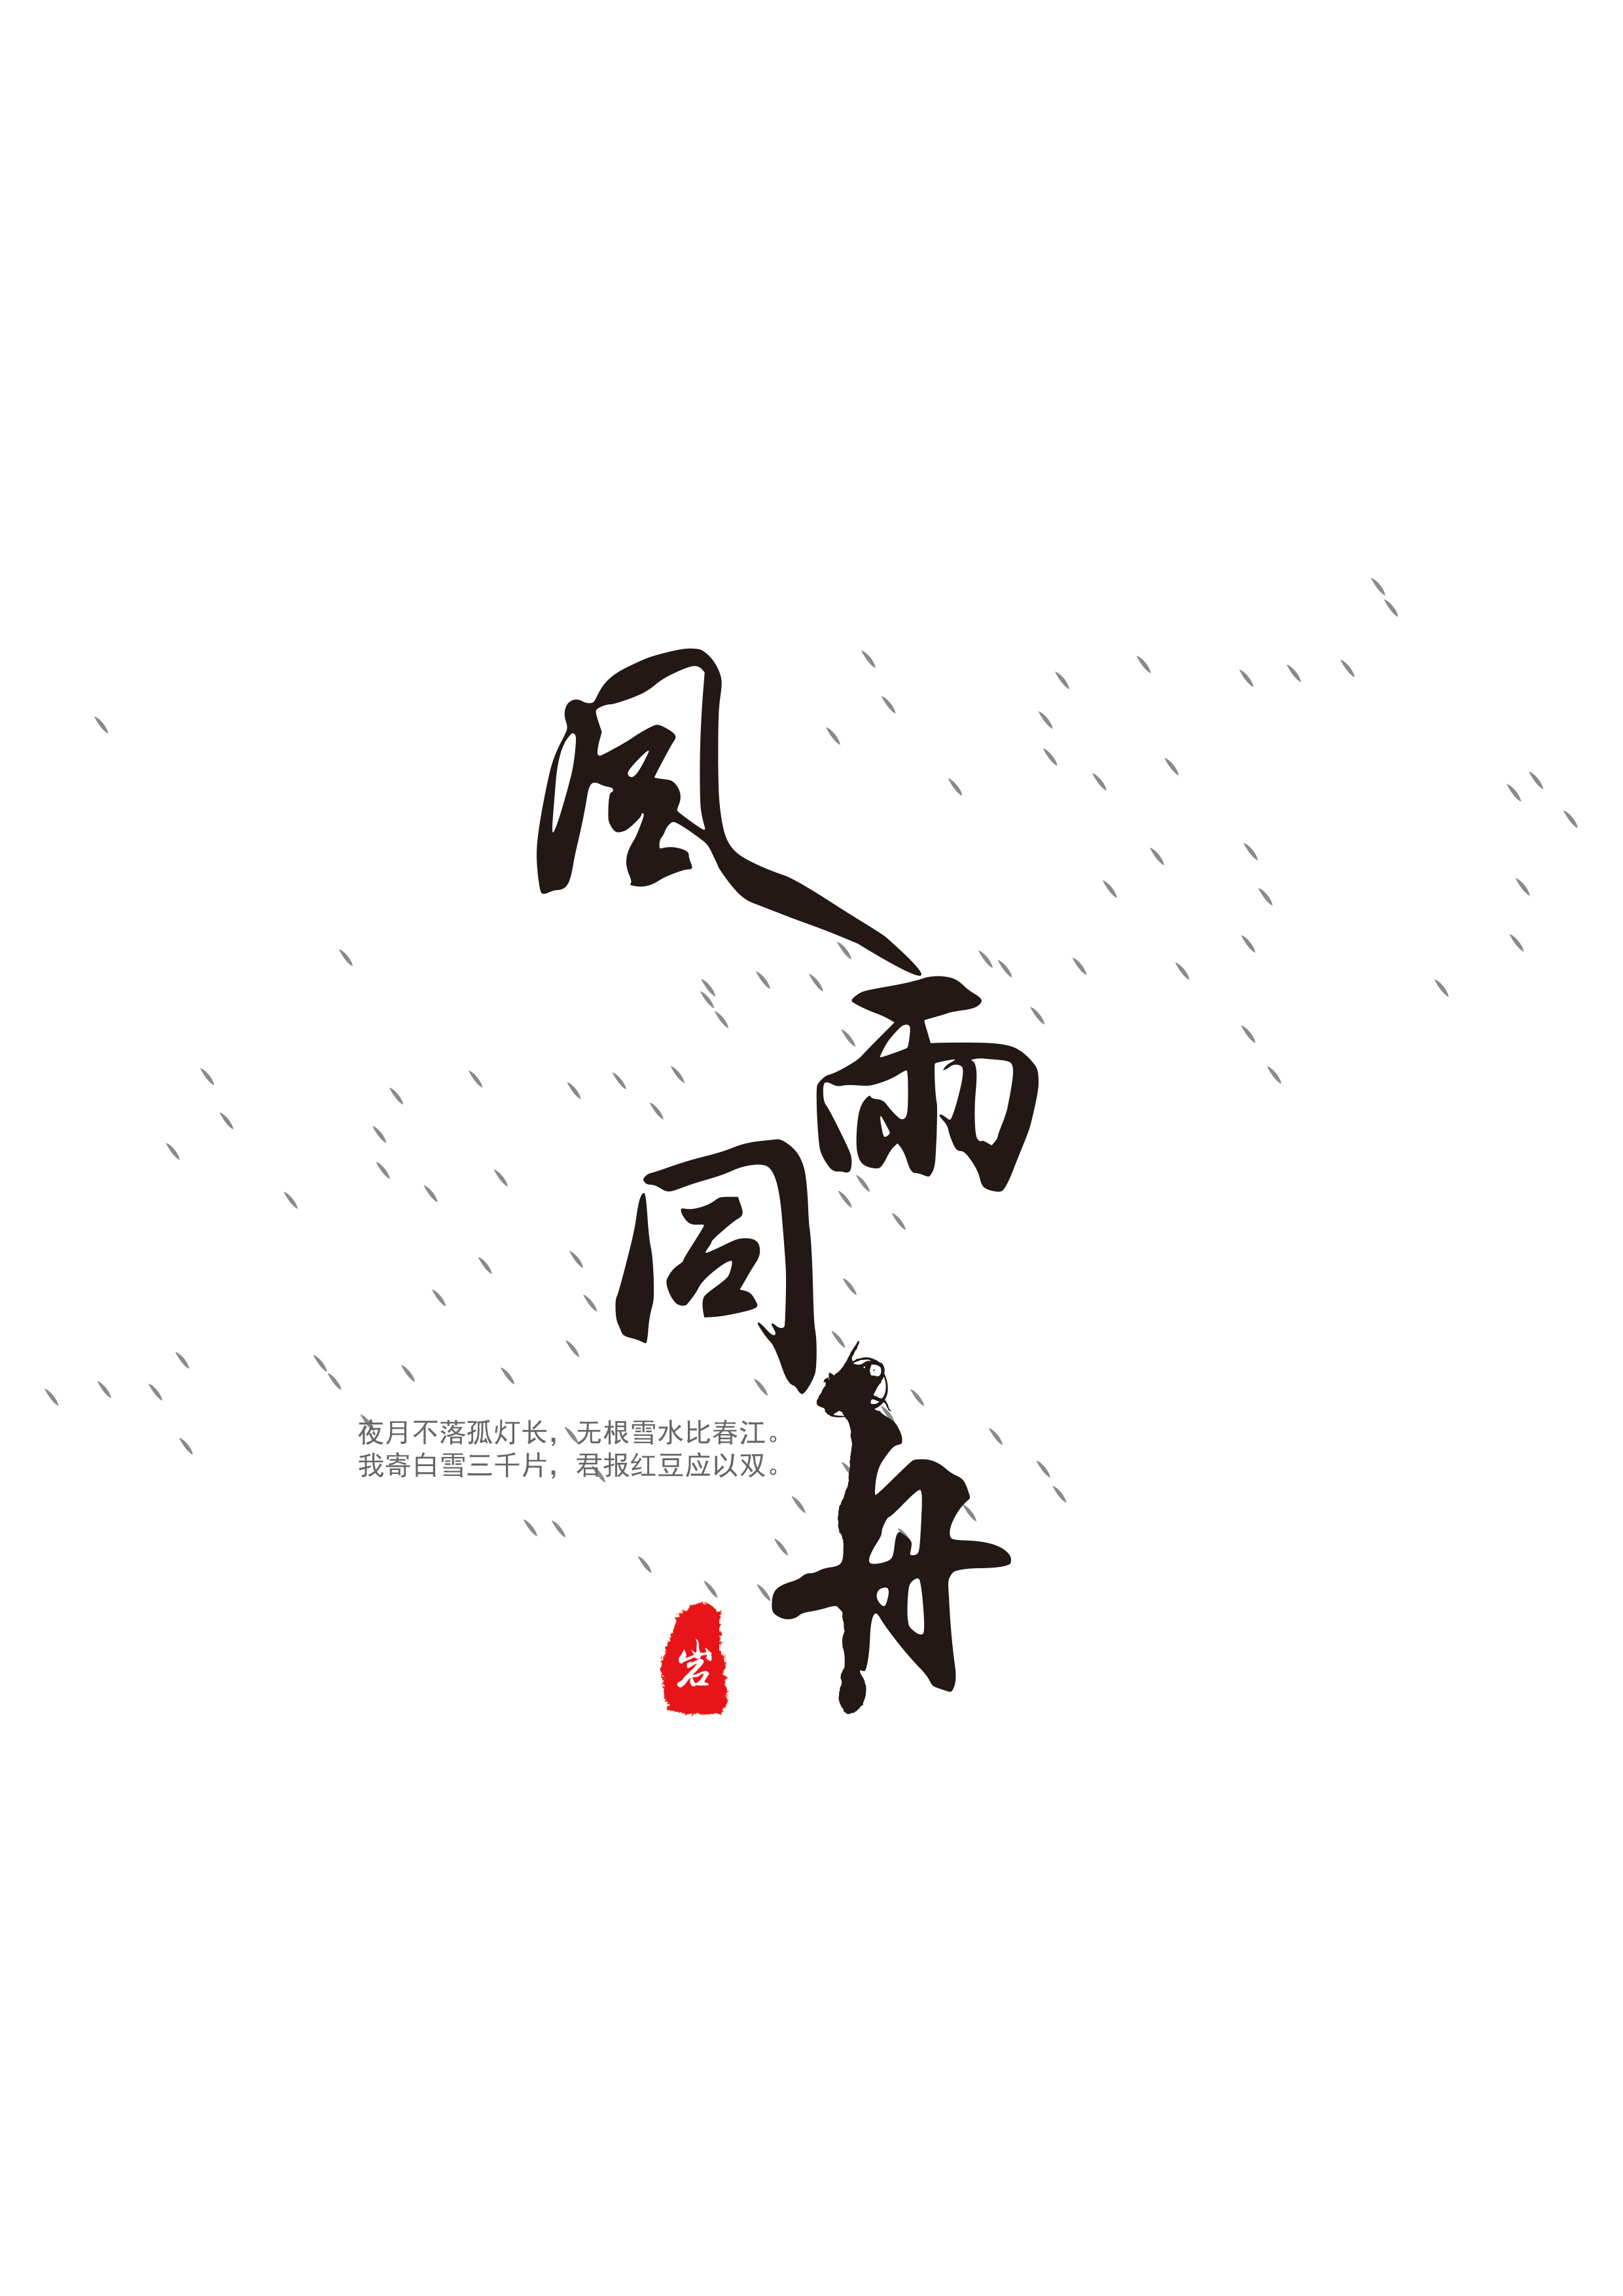 118mao_清空  118天前发布                              作品版权由mao九